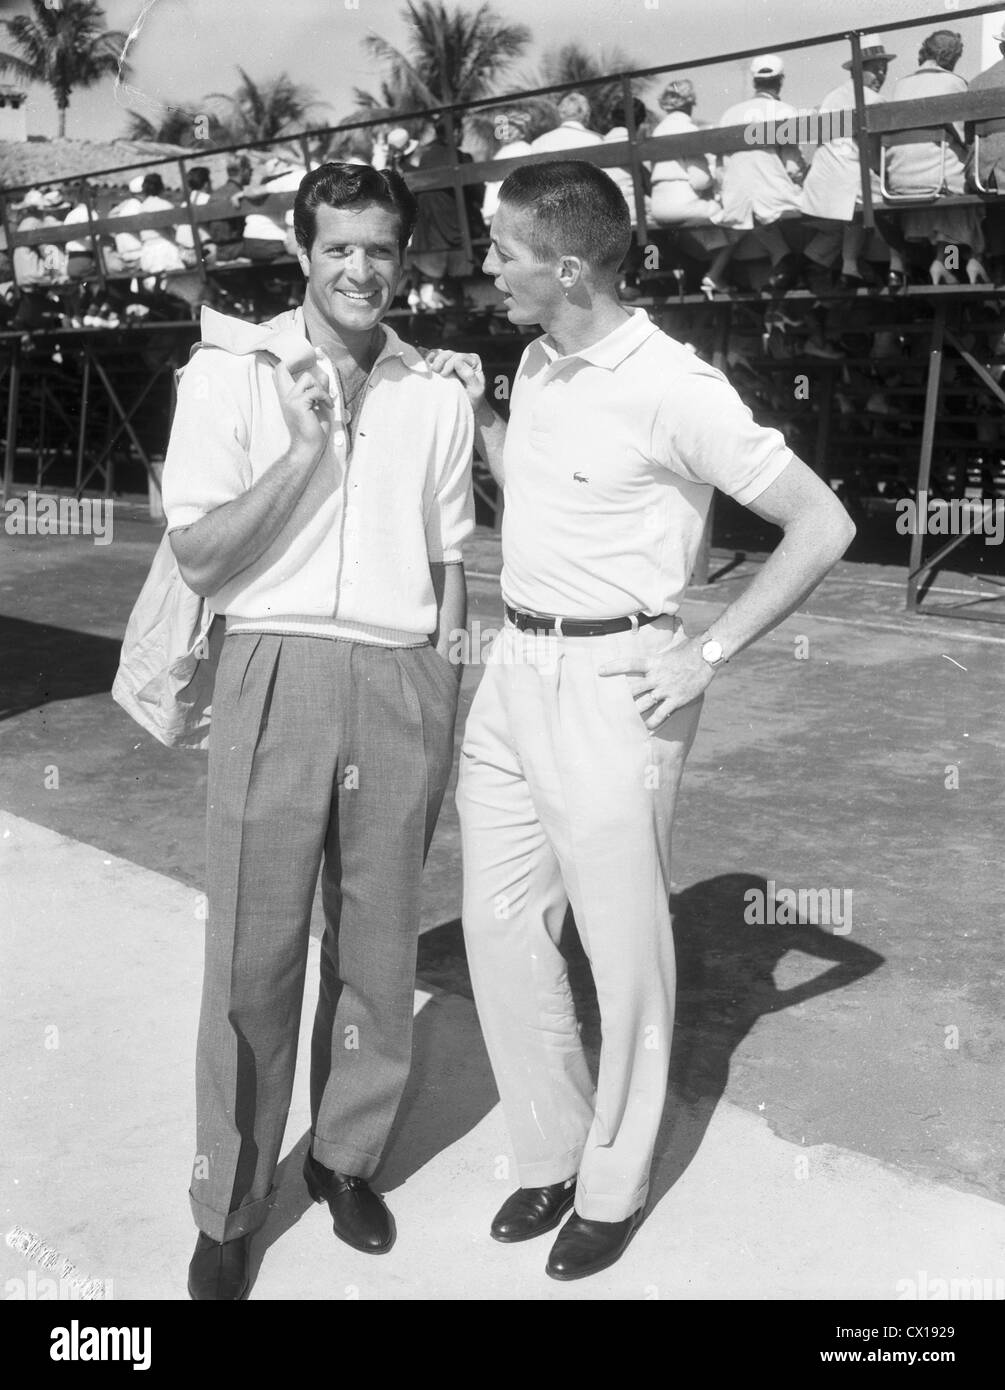 Hugh Wyatt Earp O Brien and tennis pro Tony Trabert in Palm